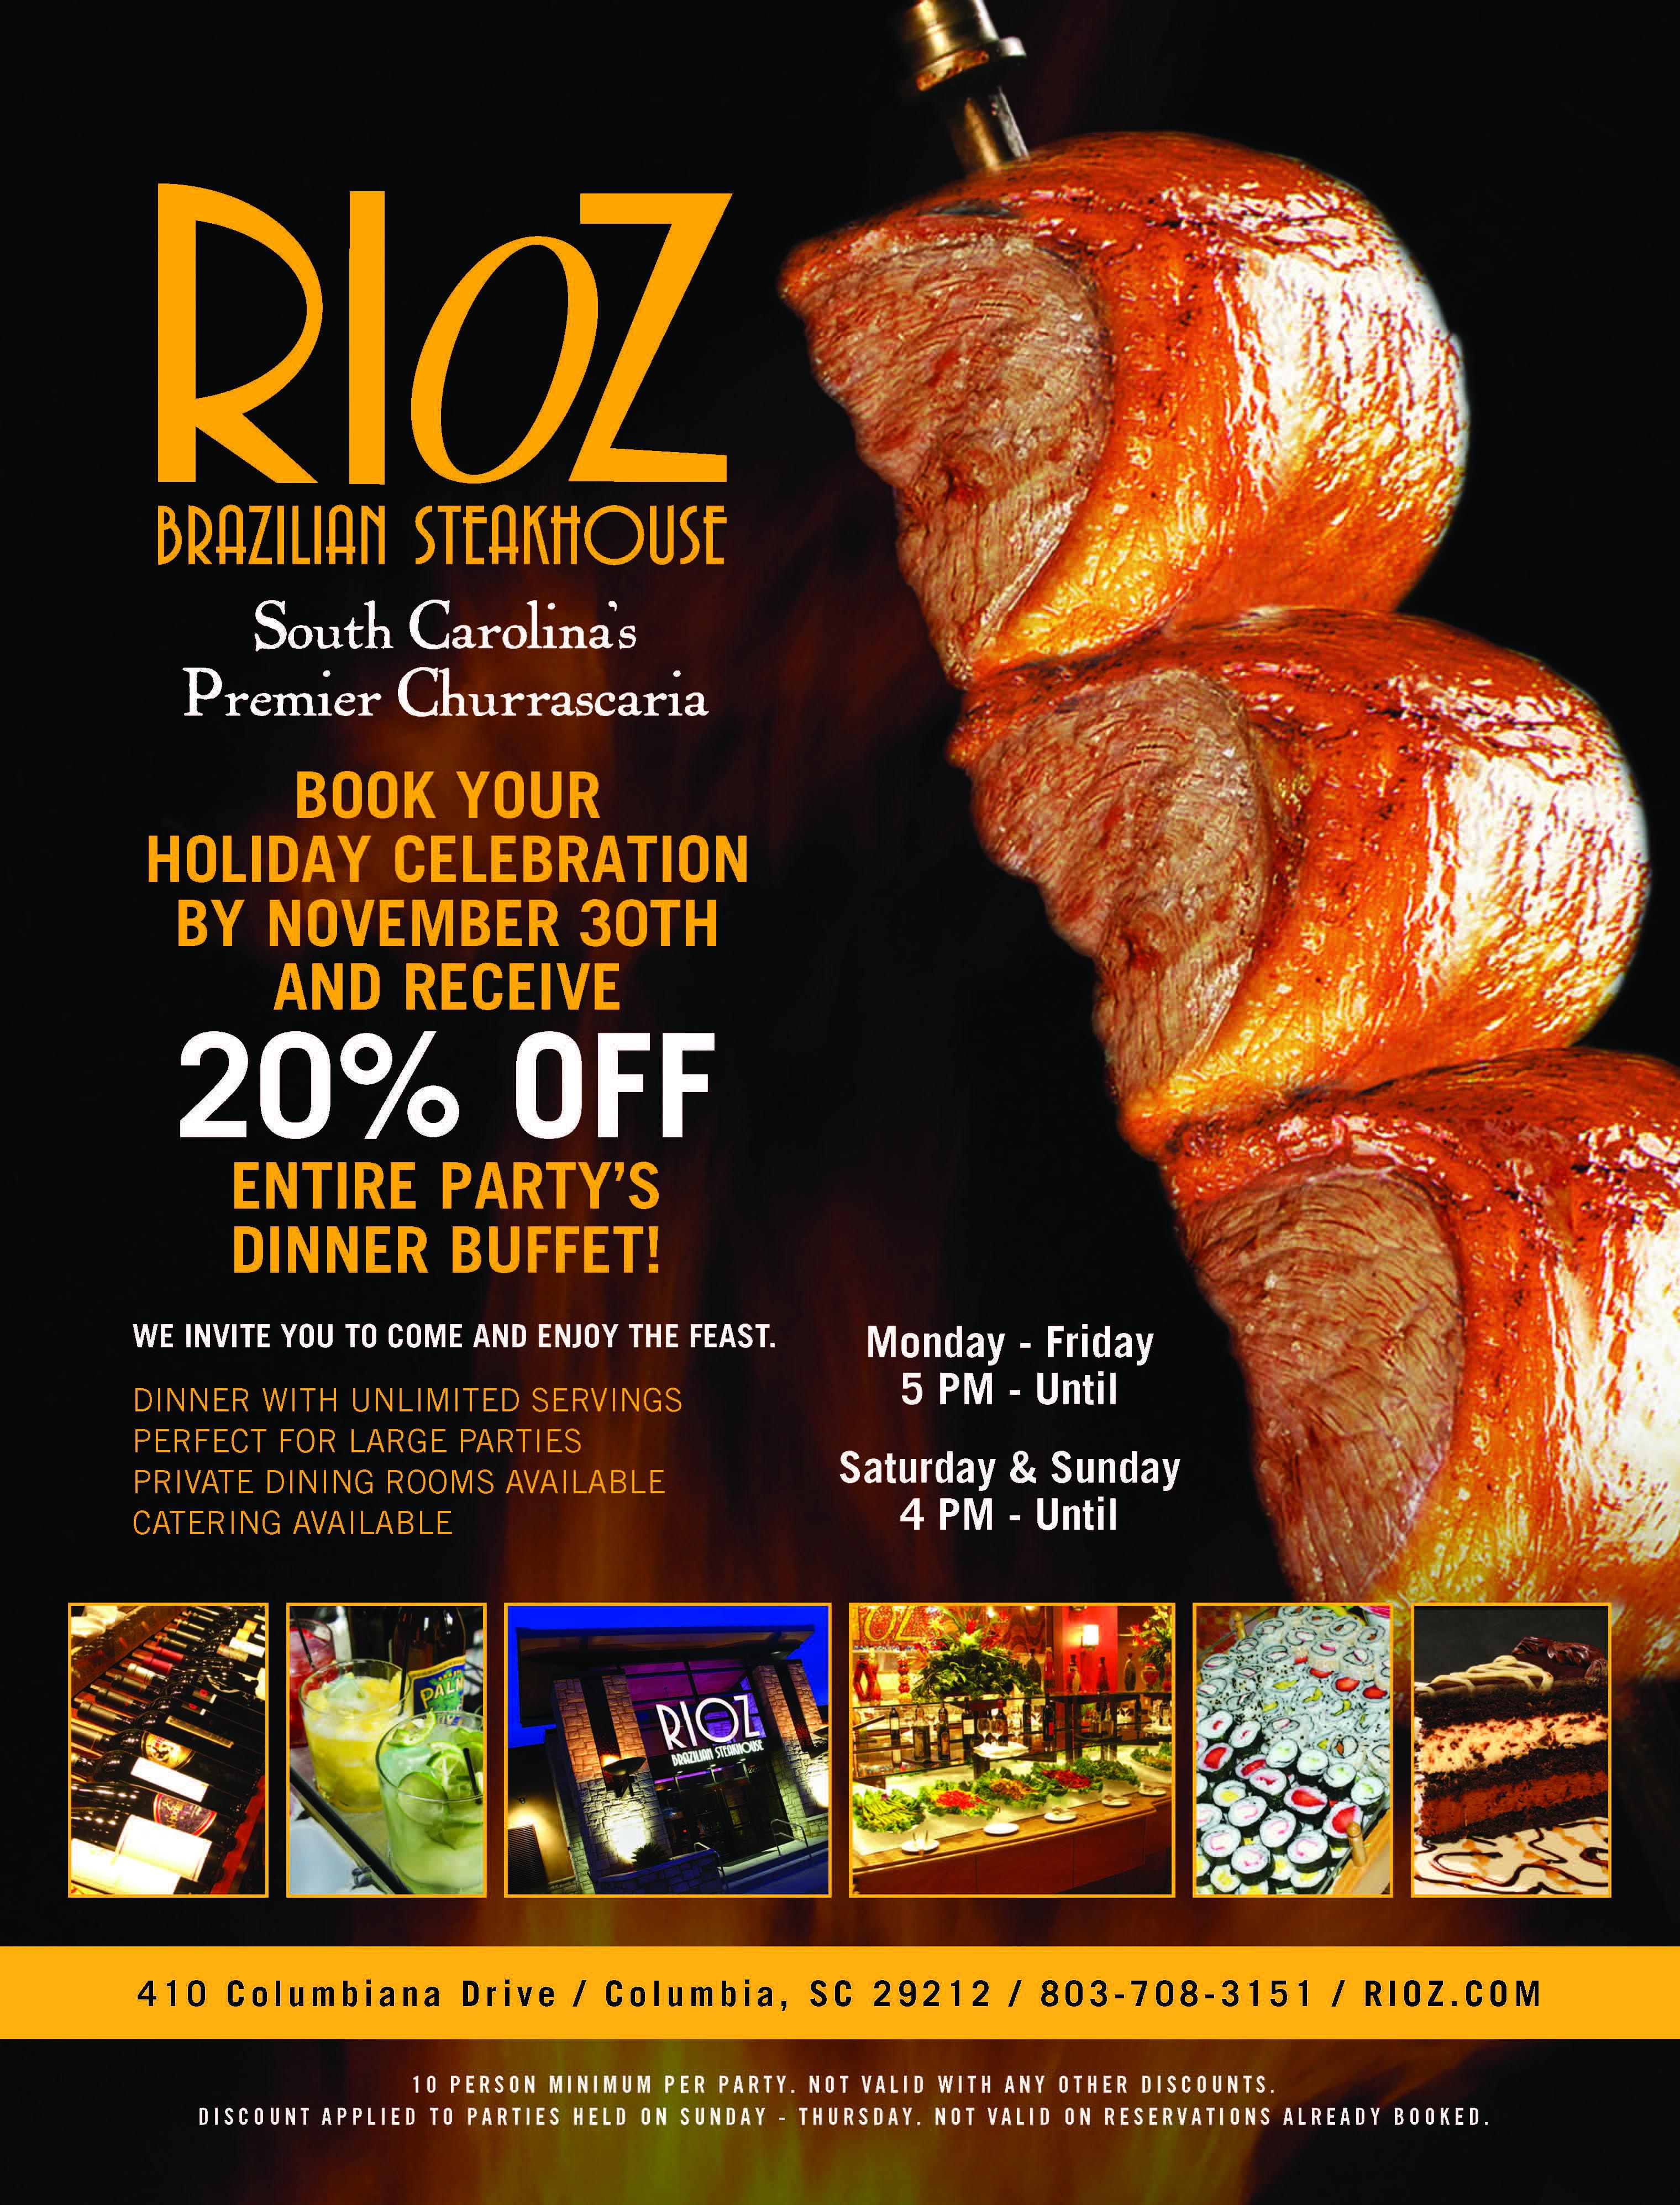 (TB400)Rioz Book Holiday Celebration Cola.jpg